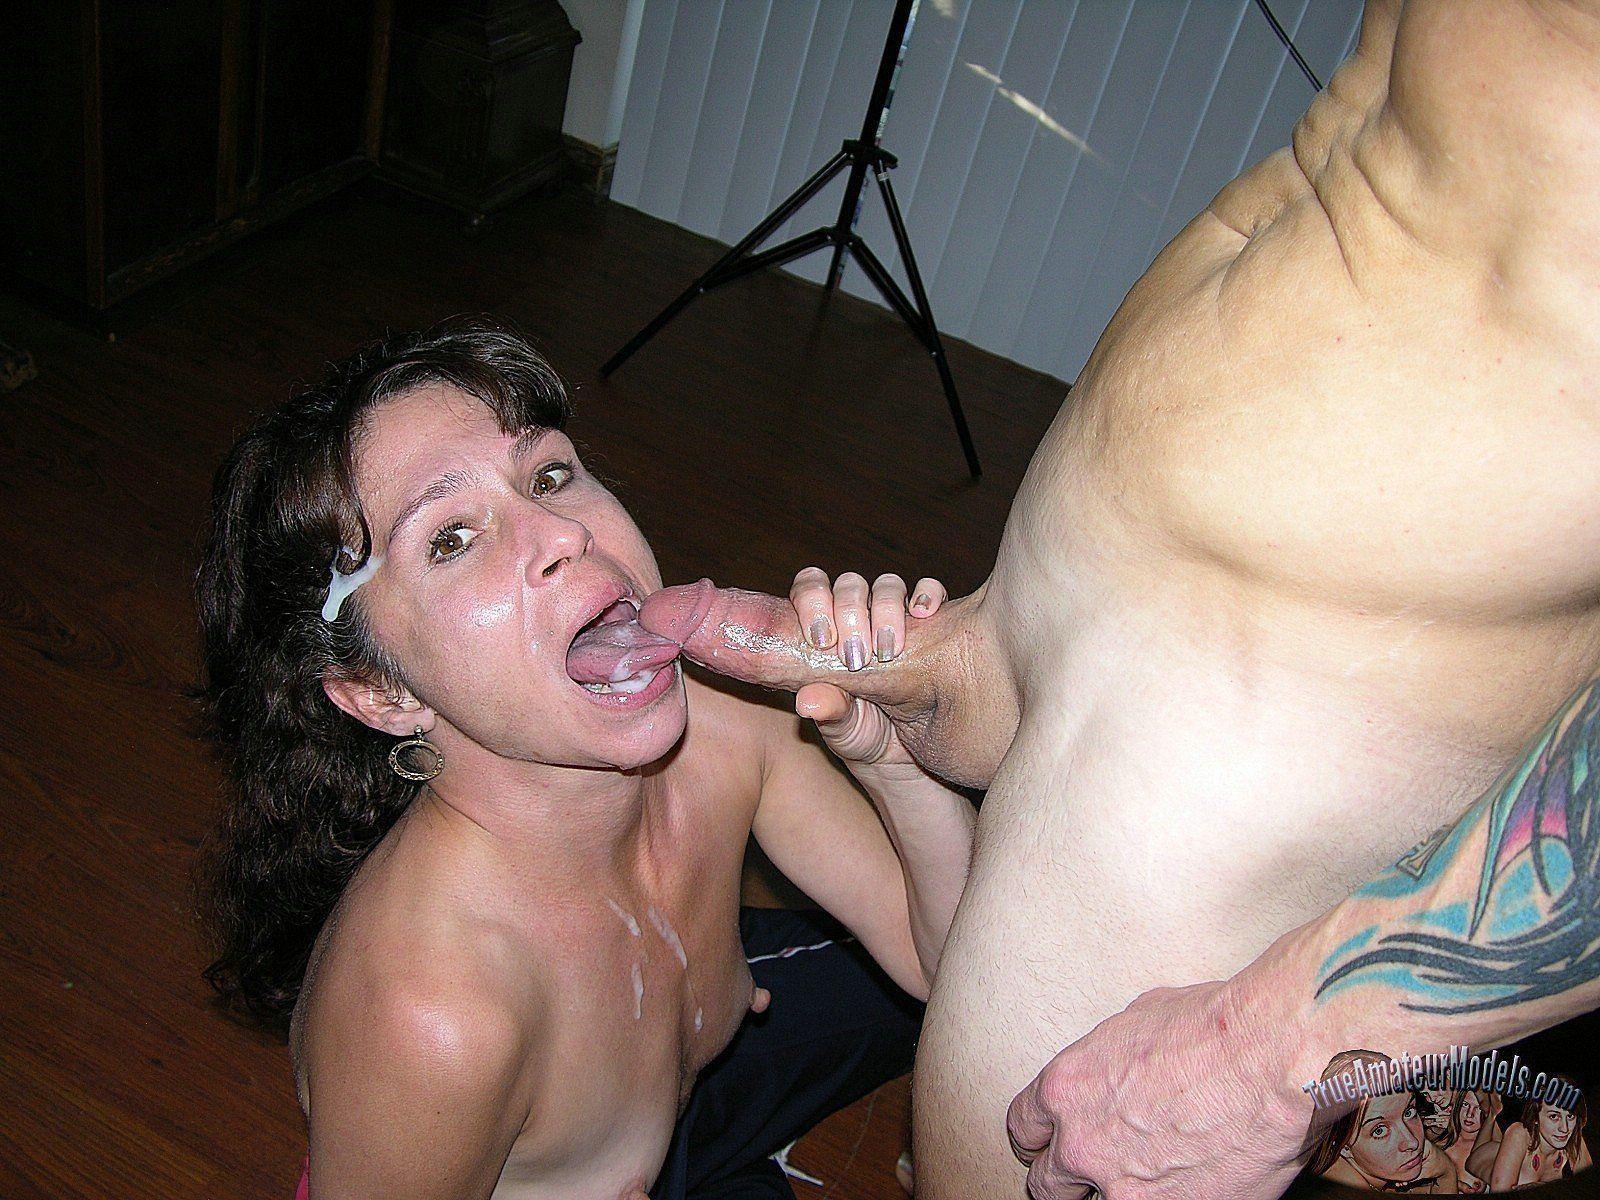 Streaming vibrator orgasms